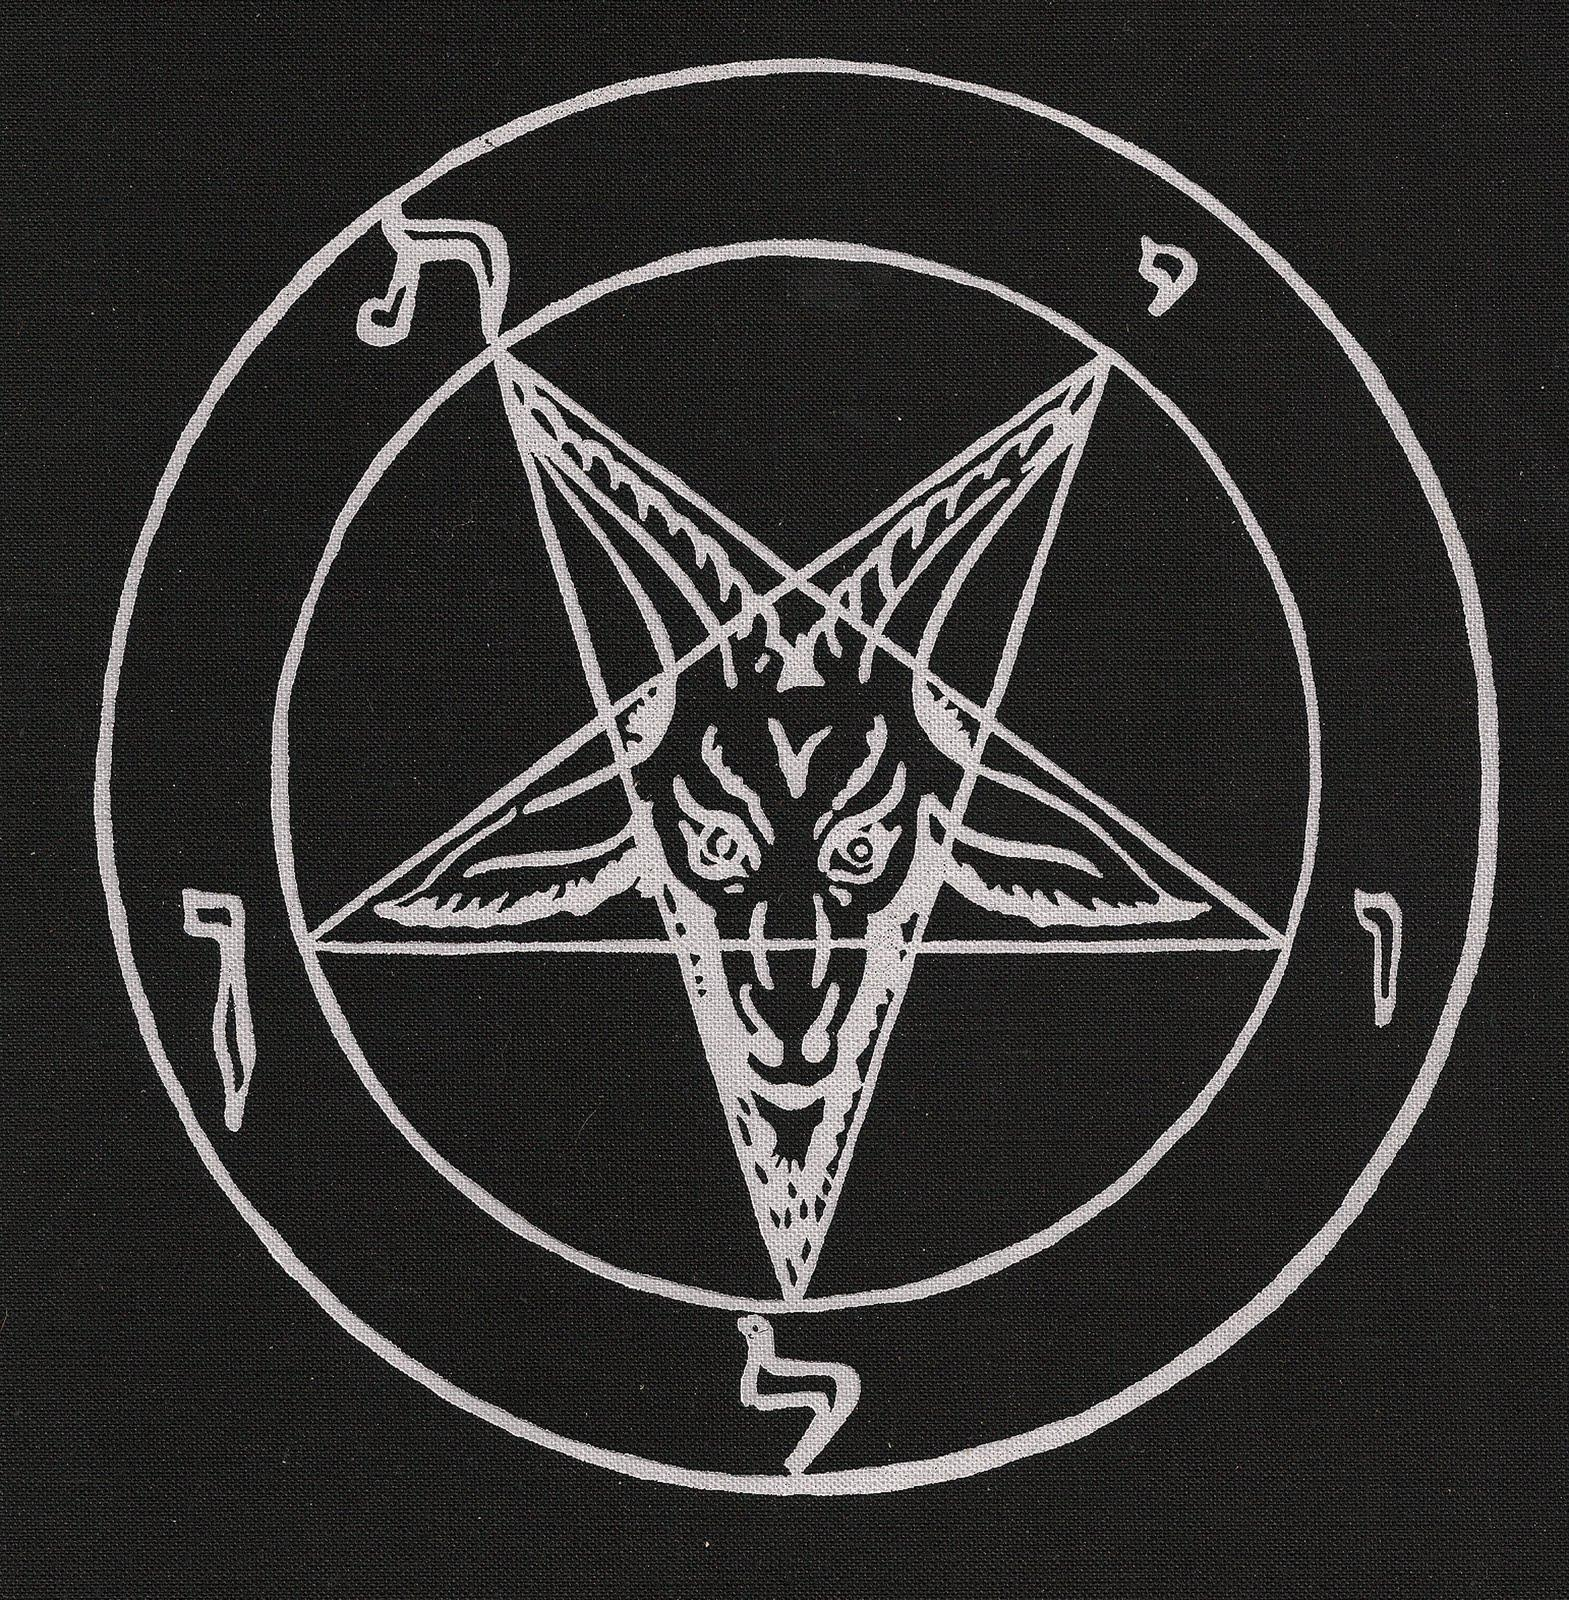 Pentagram Wallpapers Top Free Pentagram Backgrounds Wallpaperaccess